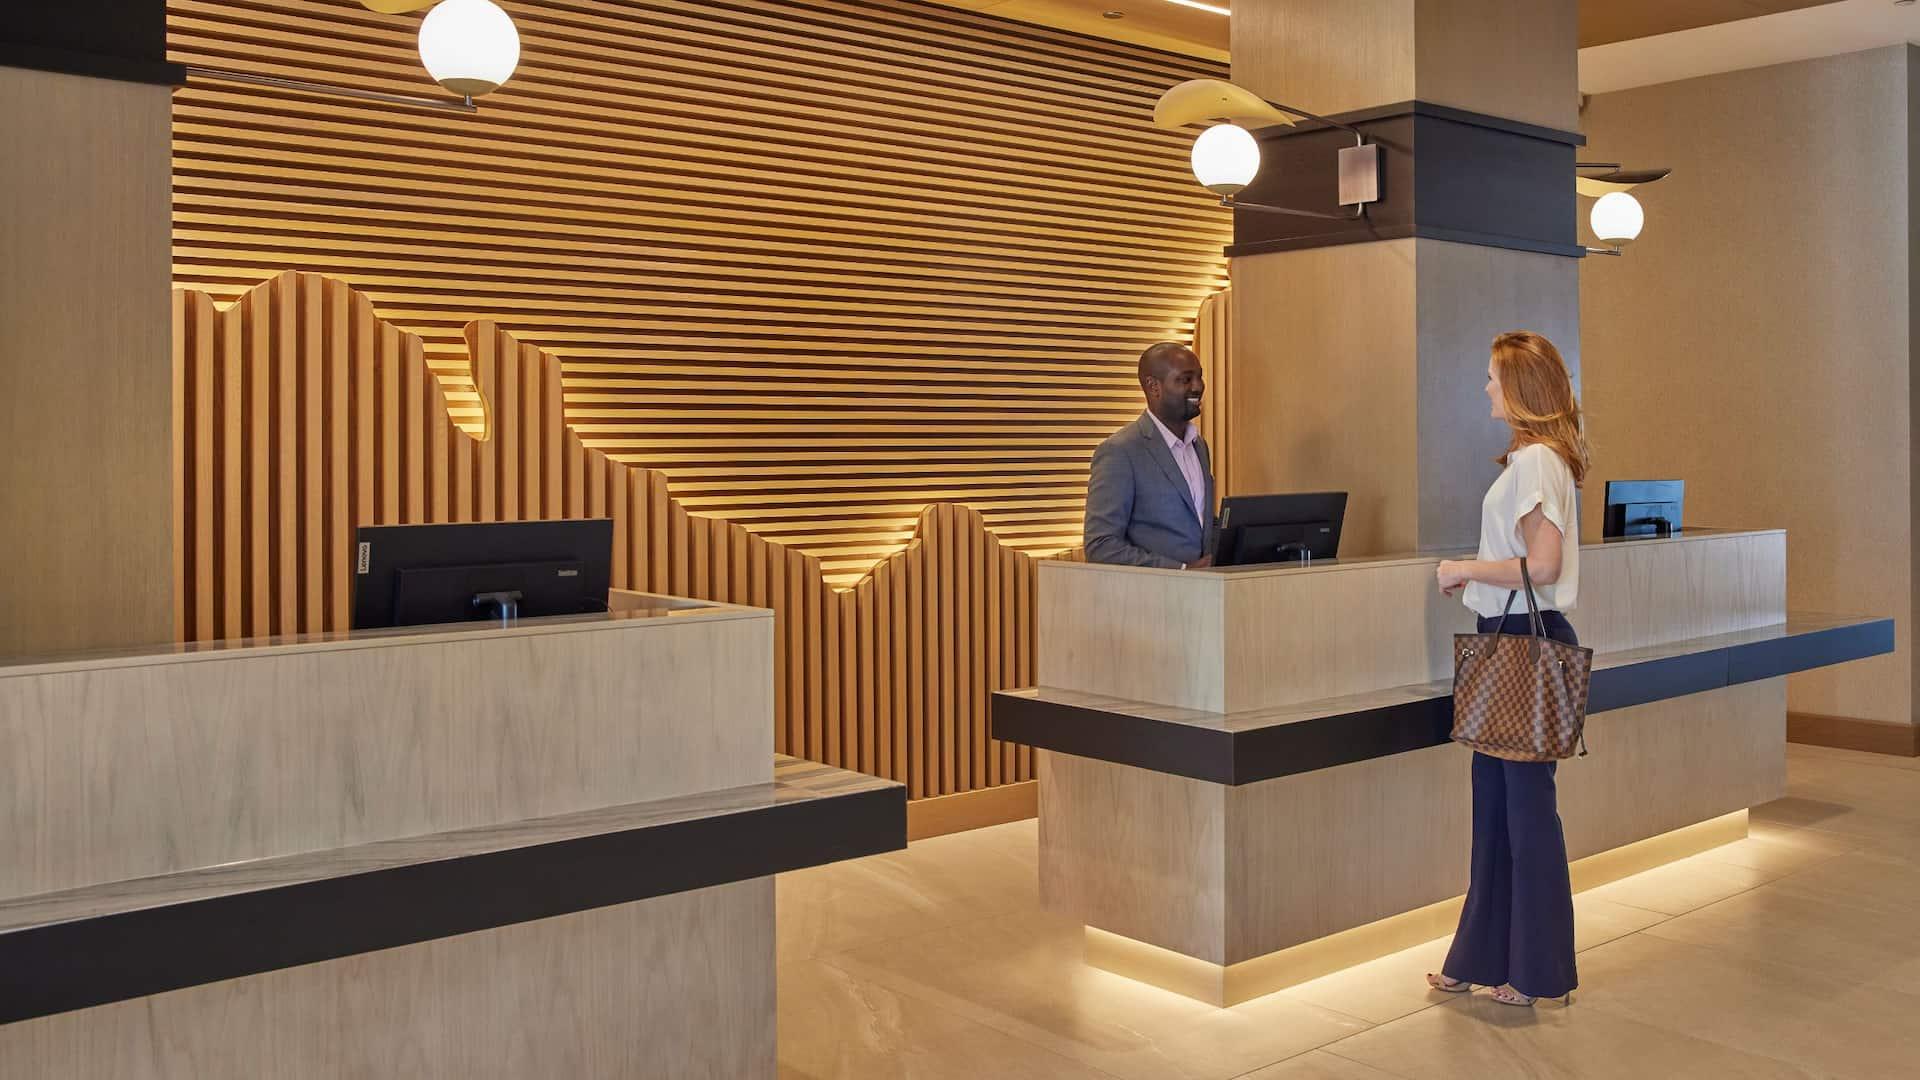 Hotel Guests Hyatt Regency La Jolla at Aventine